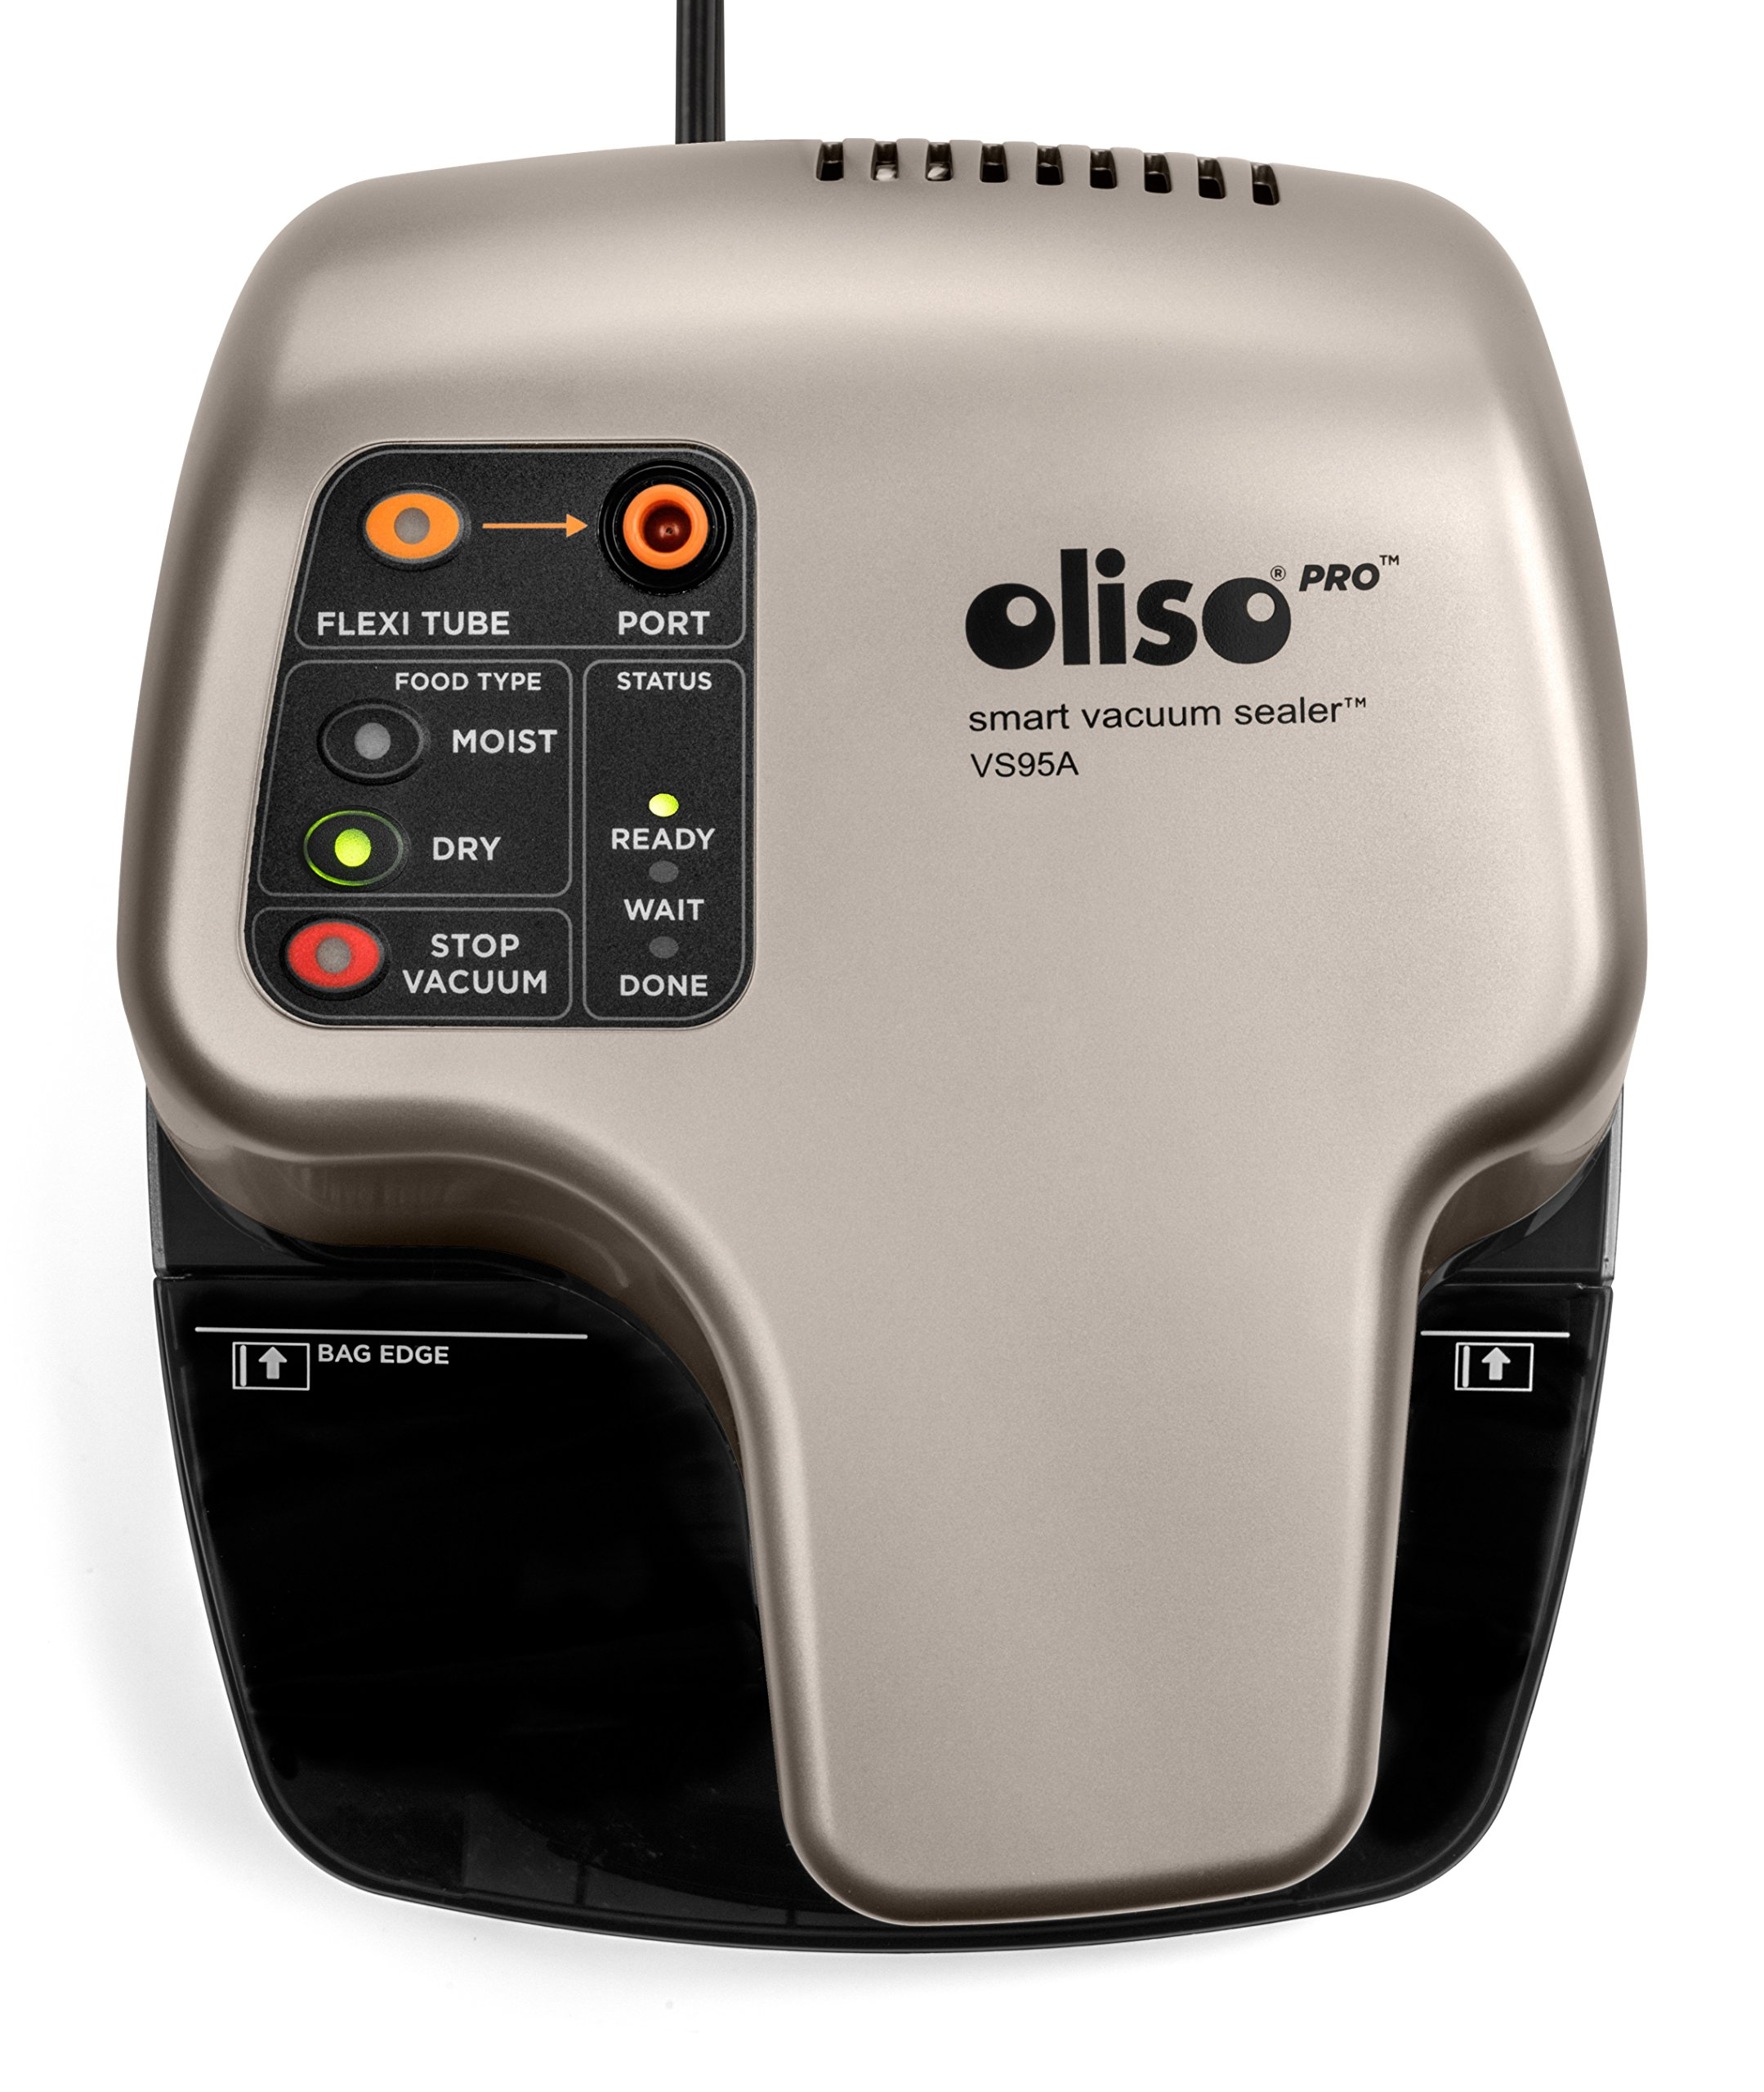 Oliso Pro VS95A Smart Vacuum Sealer, Silver by Oliso (Image #1)